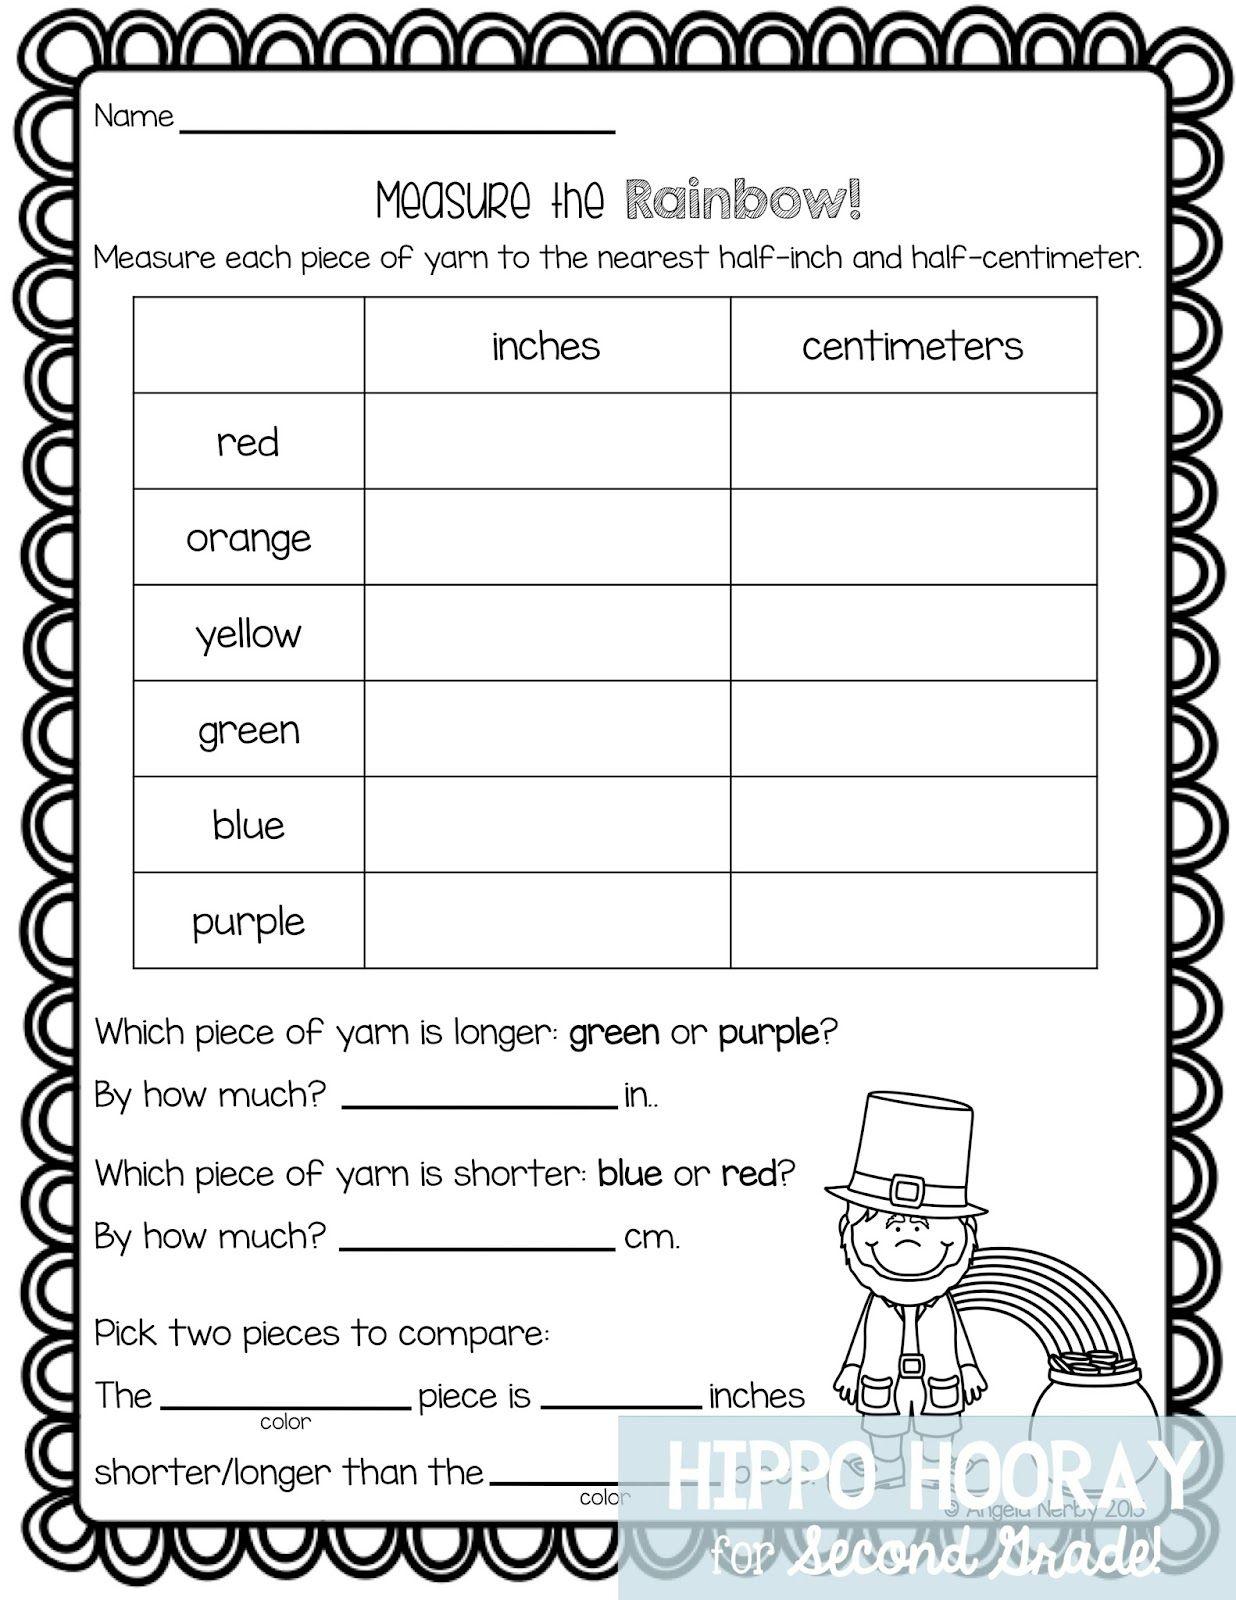 St Patrick S Day Math Freebie Measurement Worksheets 2nd Grade Math Worksheets Third Grade Math Worksheets